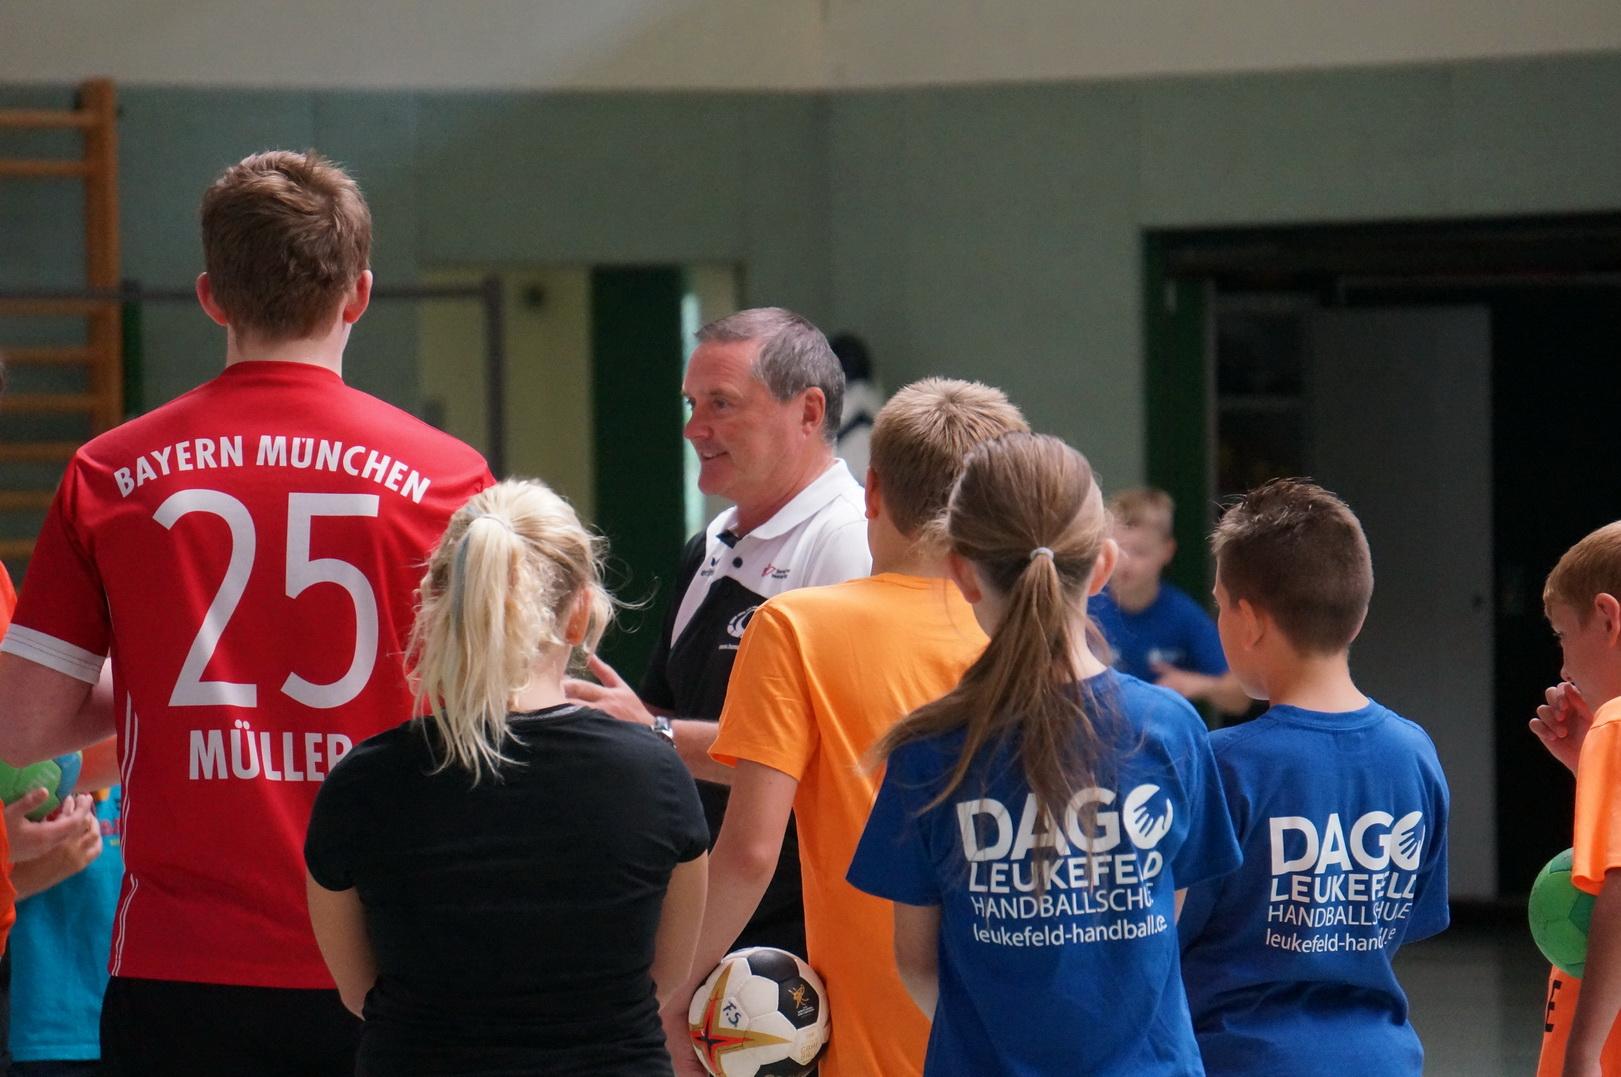 201808_Handballcamp_SDH_MG_145w